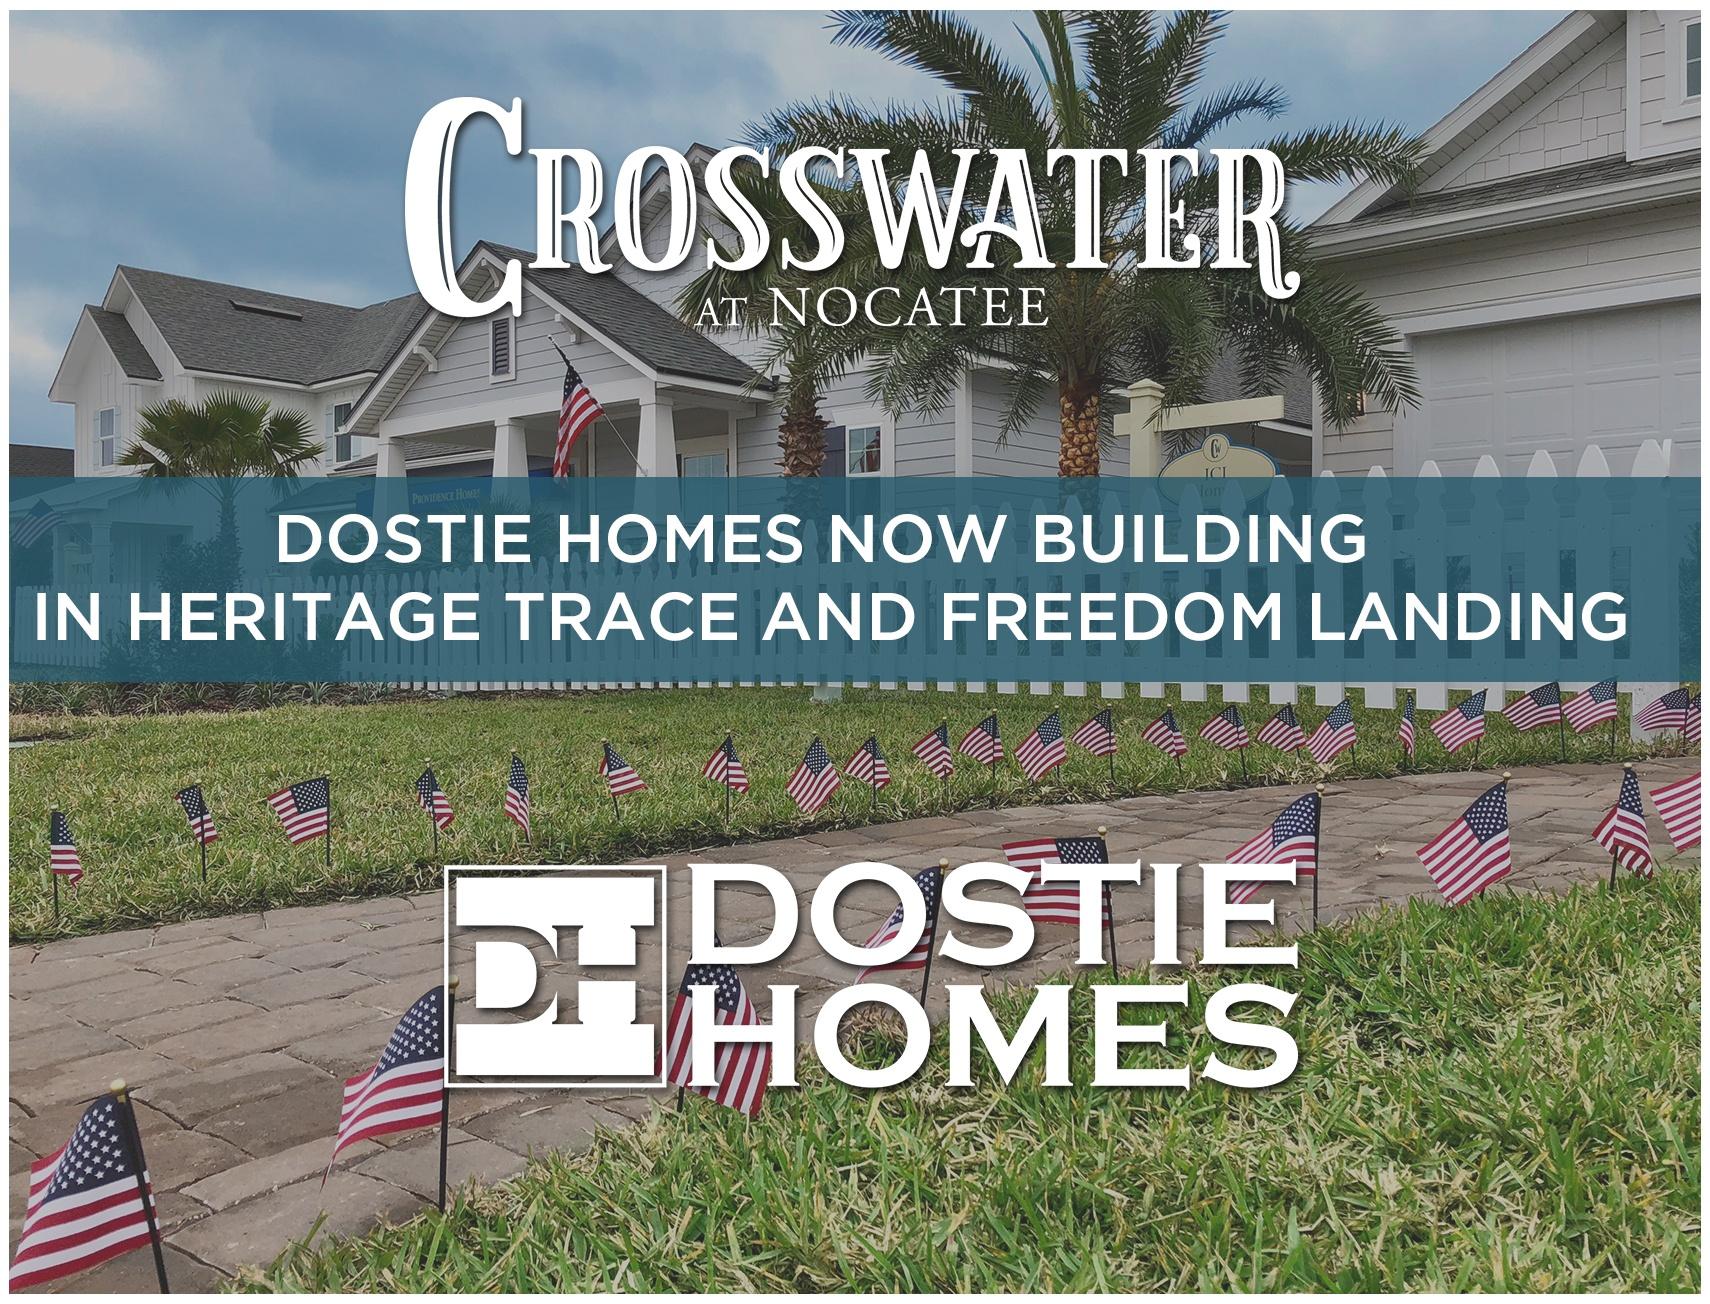 Dostie Homes Selling in Crosswater at Nocatee